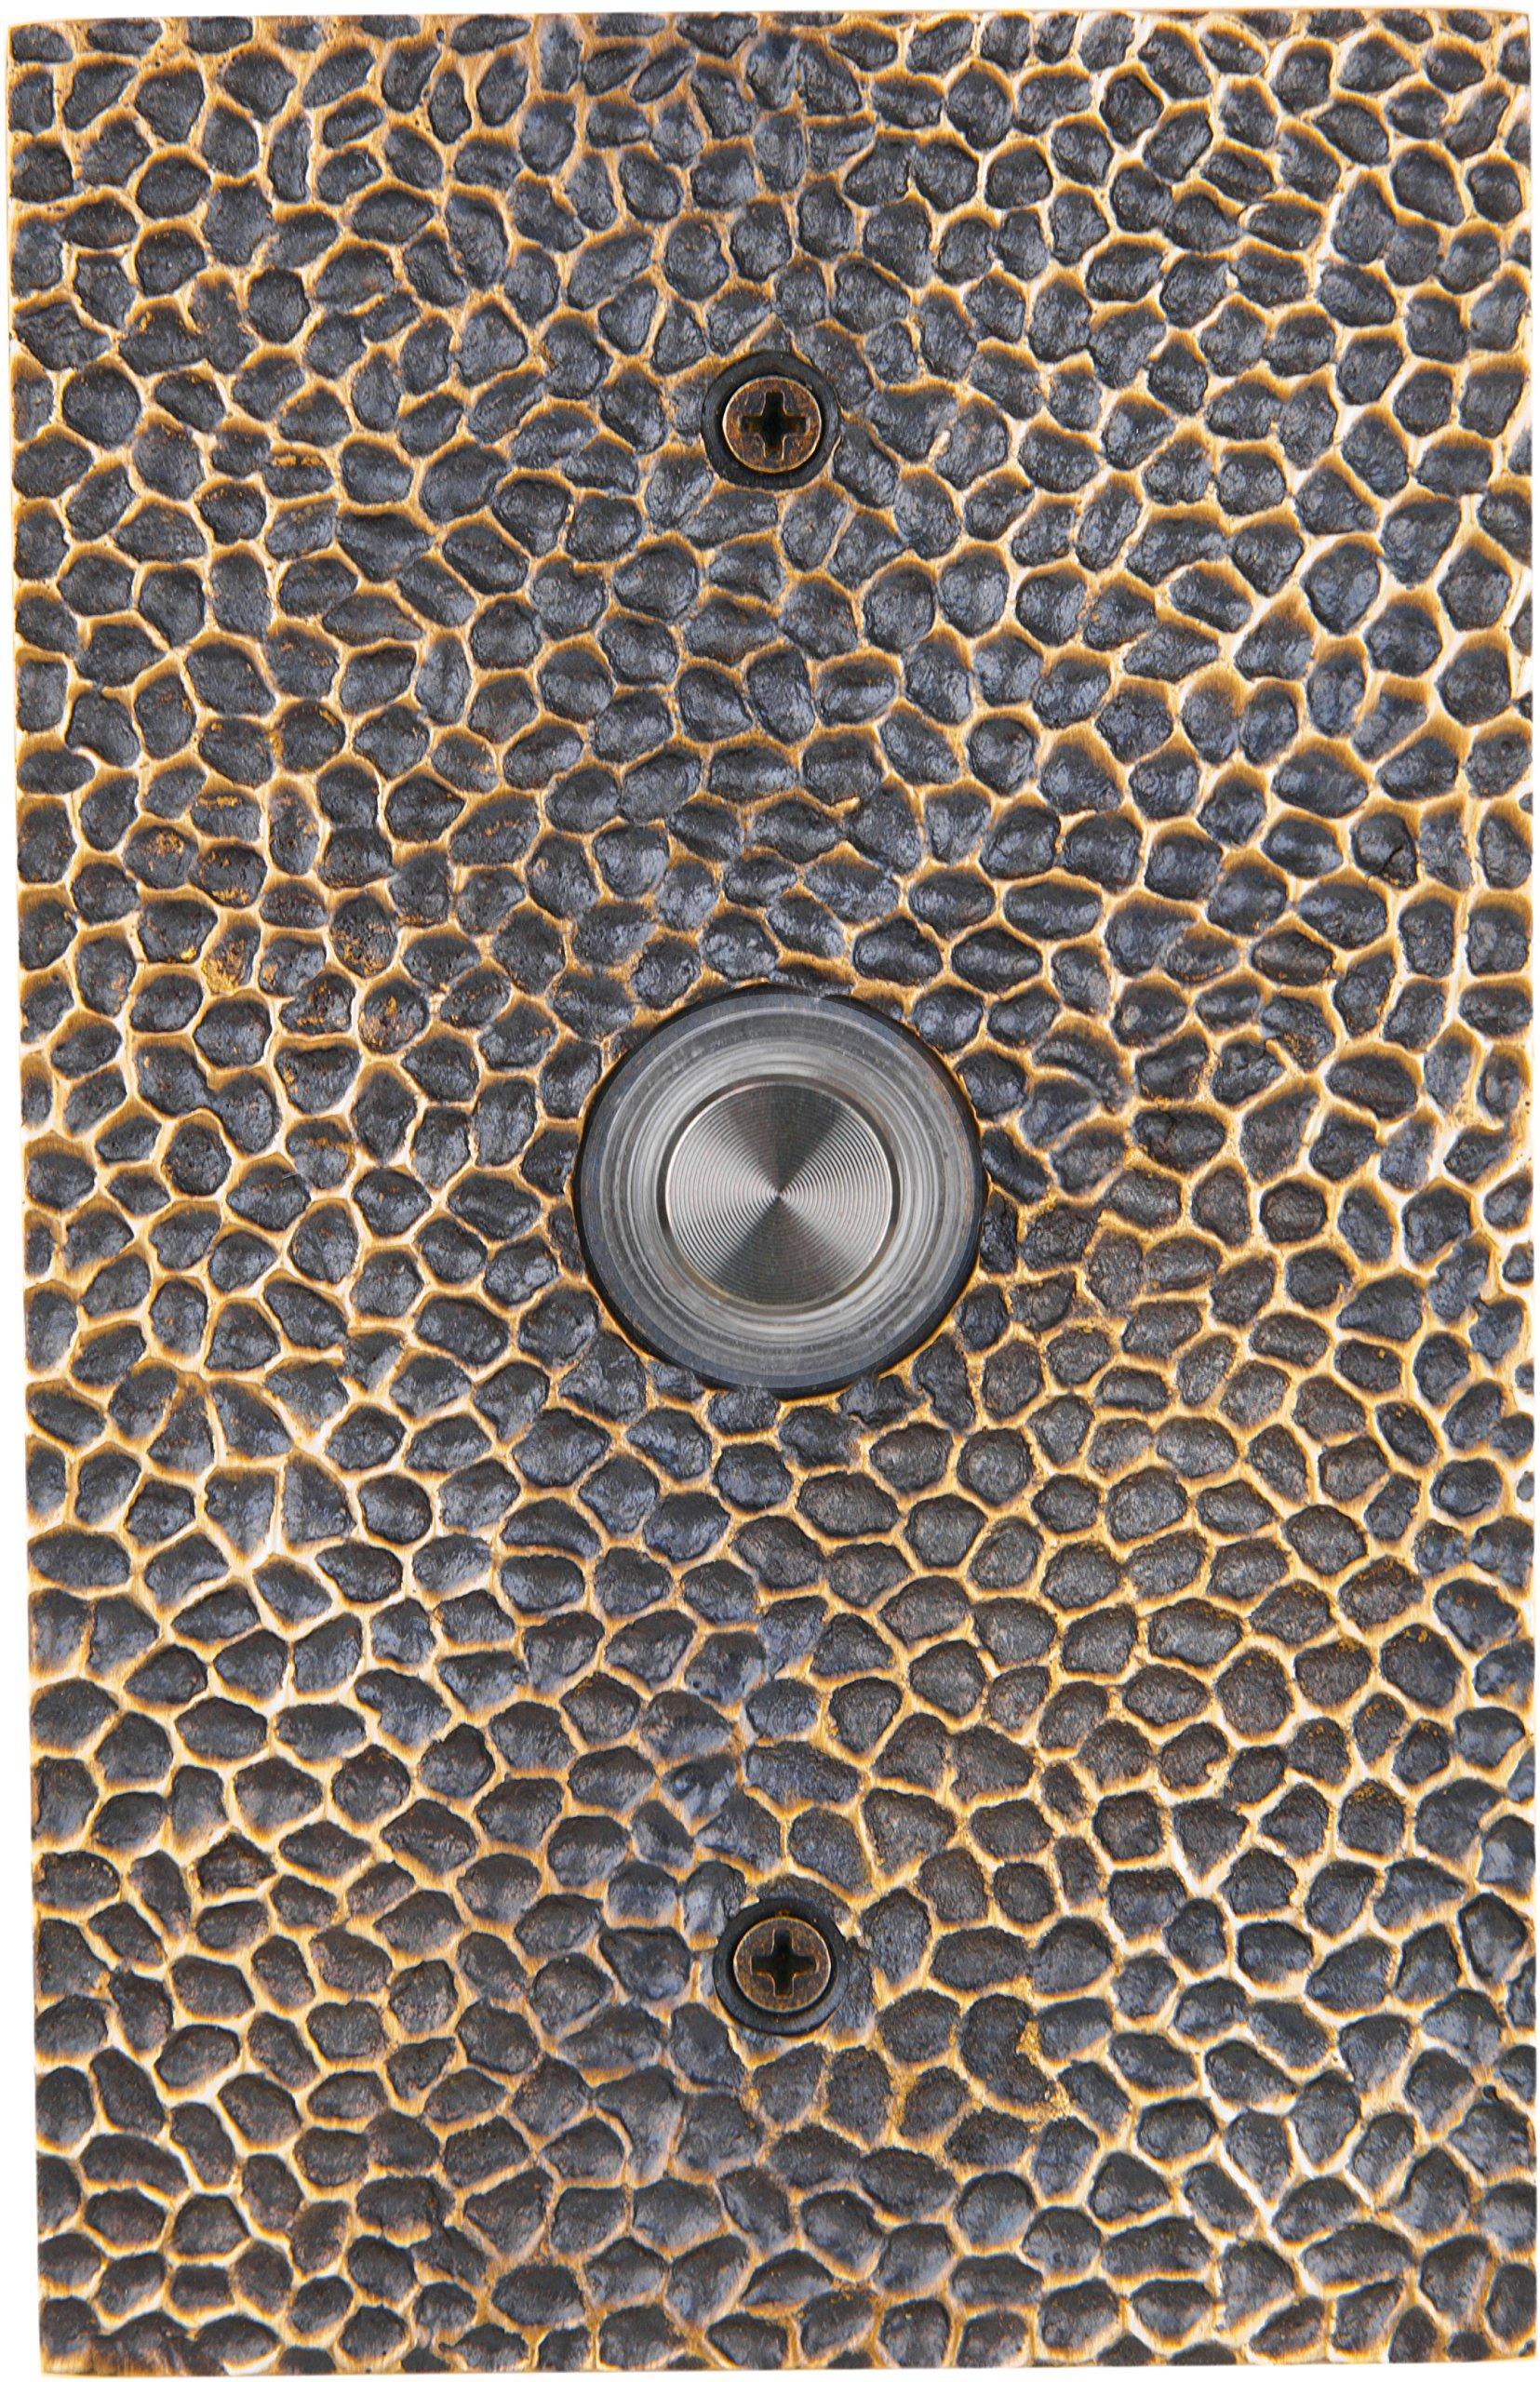 Waterwood Solid Brass Large Hammered Doorbell in Antique Brass